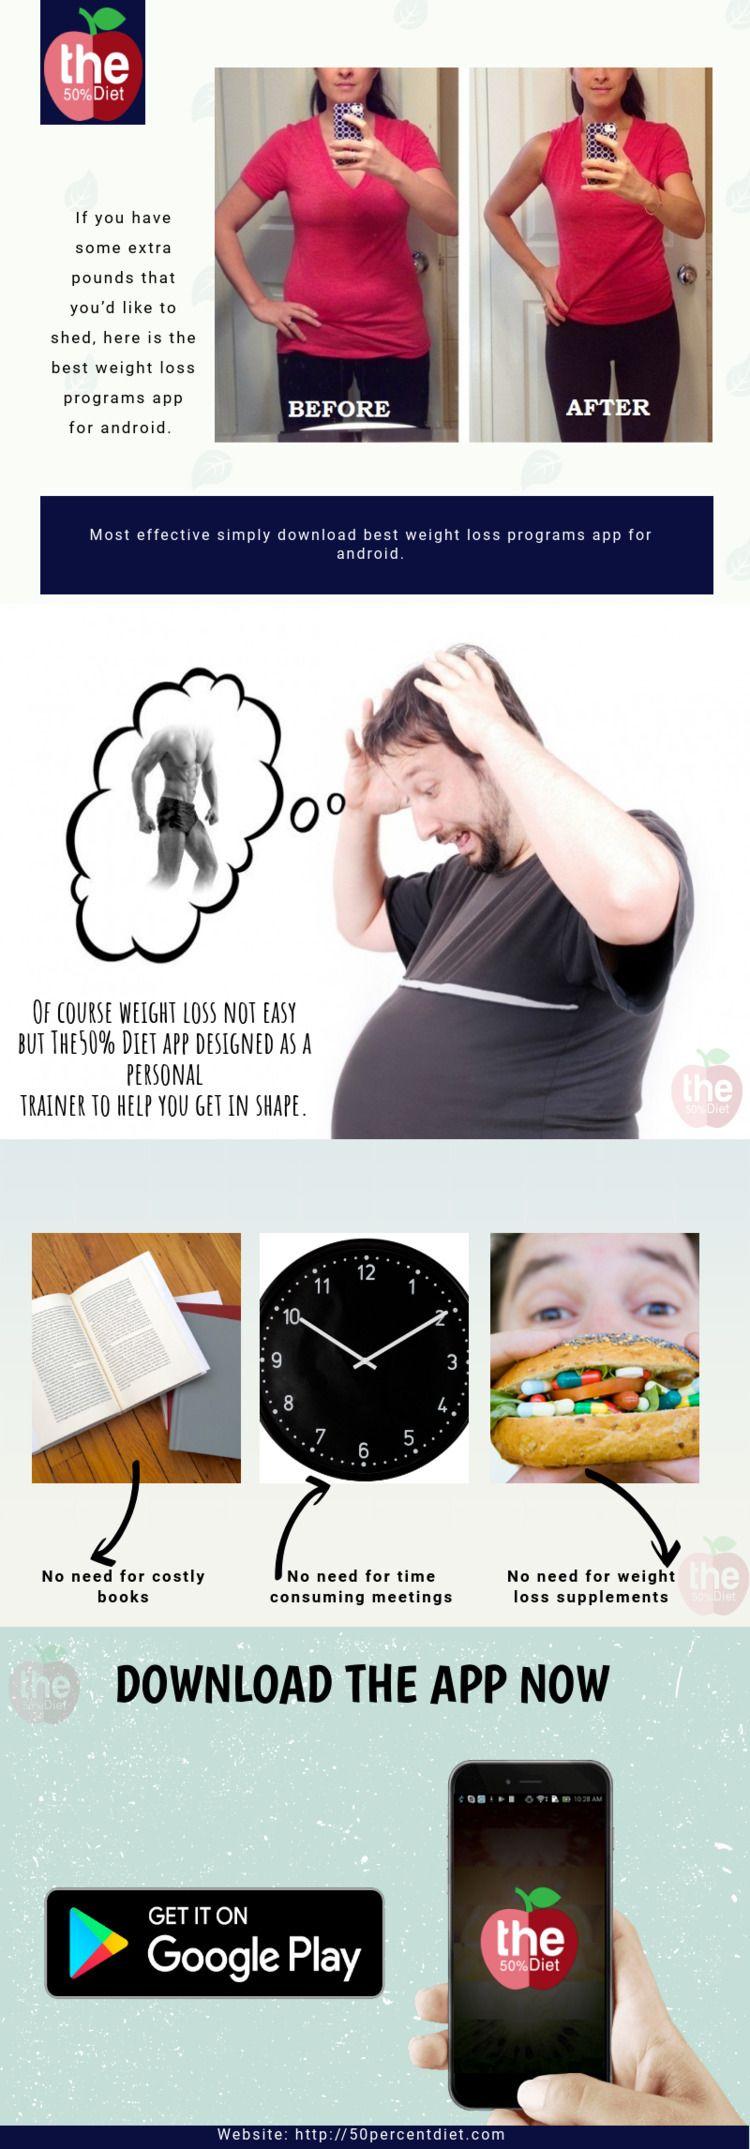 Weight Loss Programs App Androi - 50percentdiet | ello